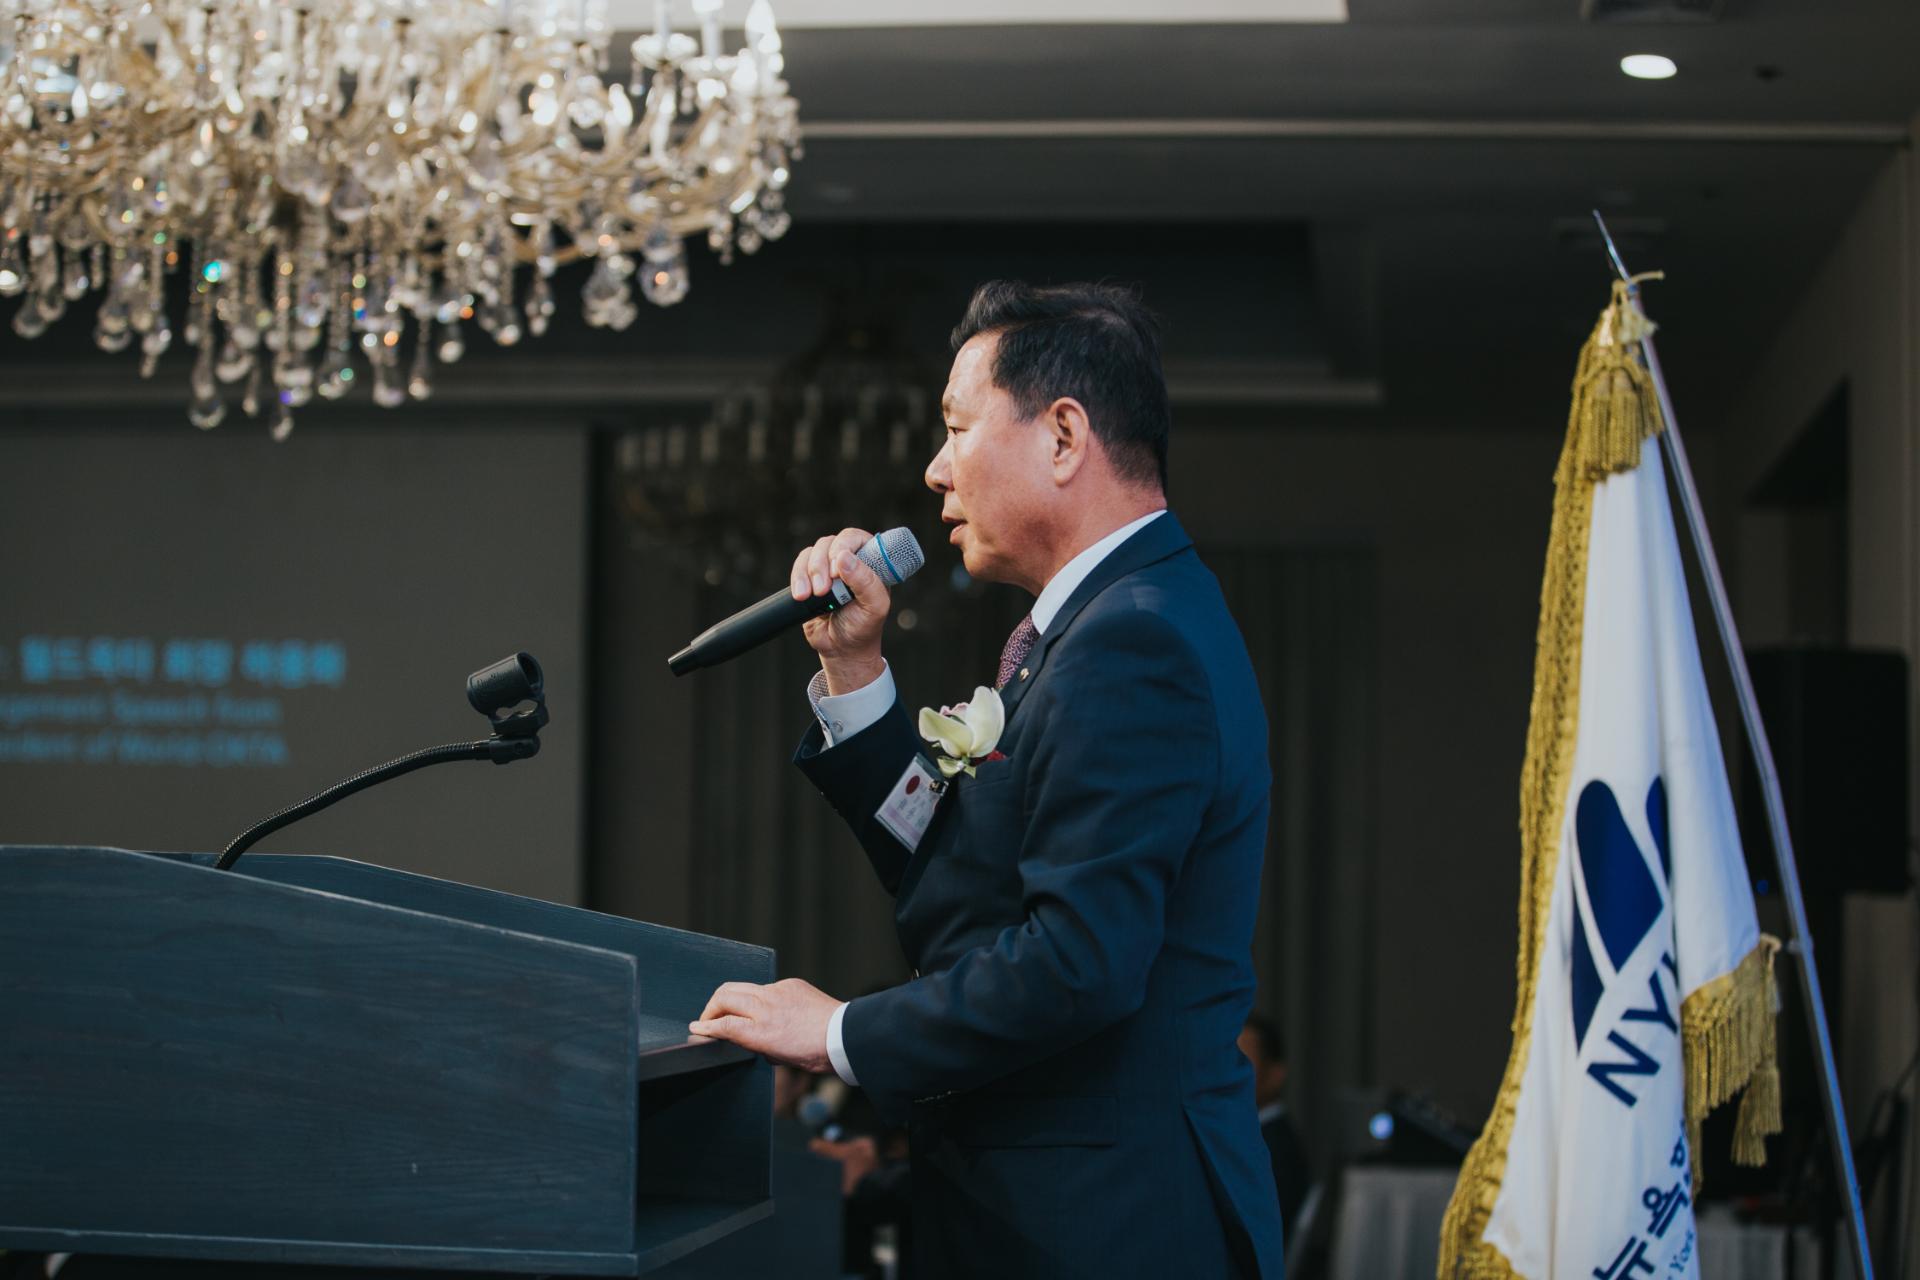 https://nykbi.com/new/wp-content/uploads/2019/07/190607-NYKBI-Inauguration-Ceremony-208.jpg